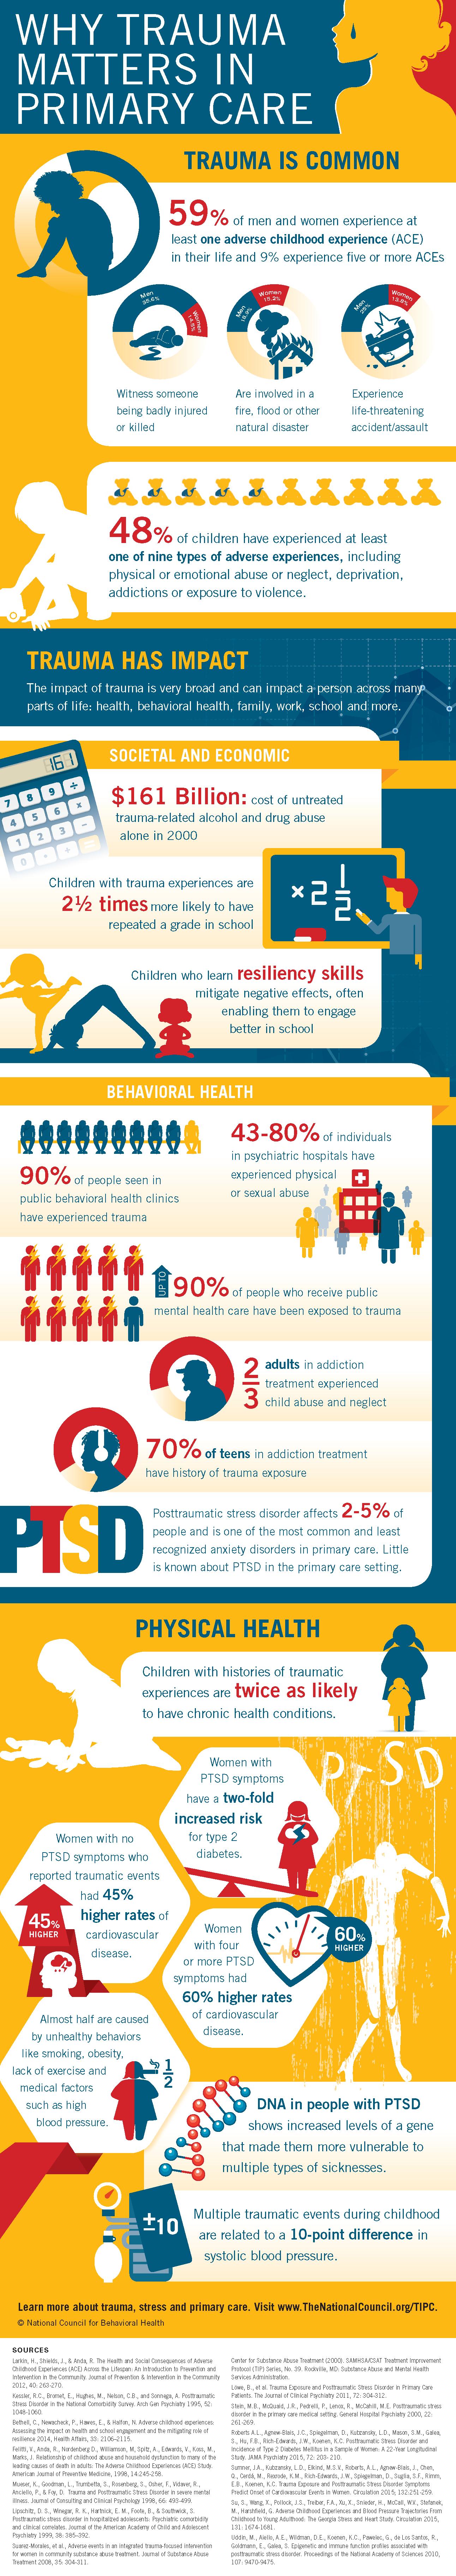 Florida Council for Community Mental Health